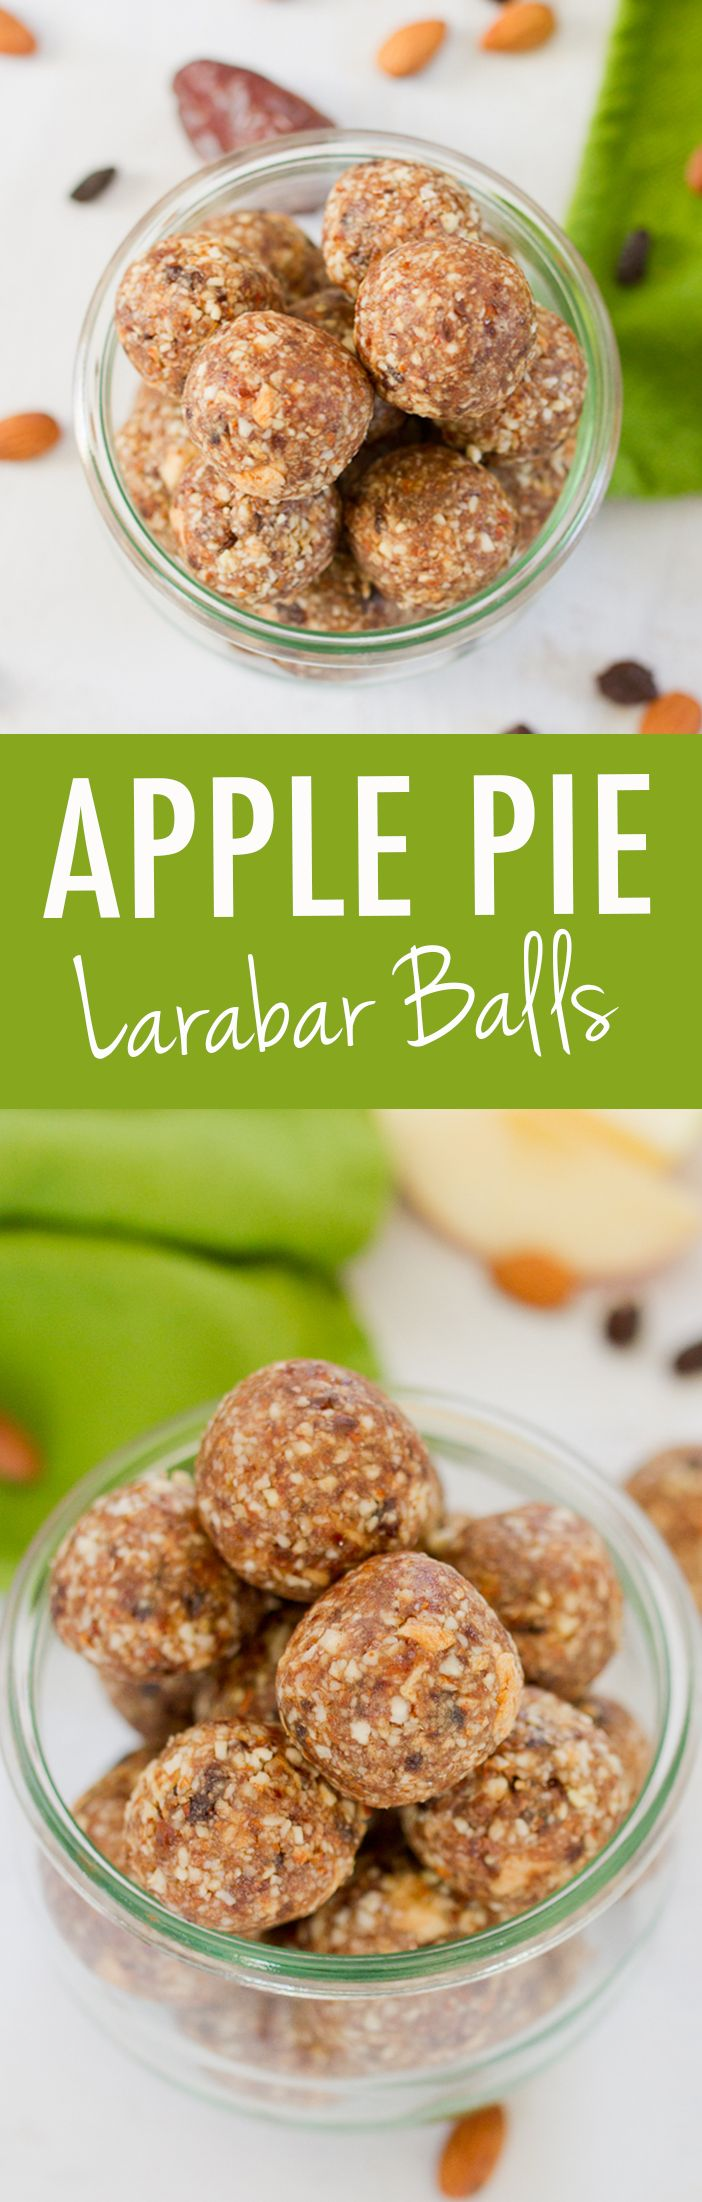 Apple Pie Larabar Balls -- Filled with apple cinnamon flavor these healthy Apple Pie Larabar Balls are the perfect portable snack.